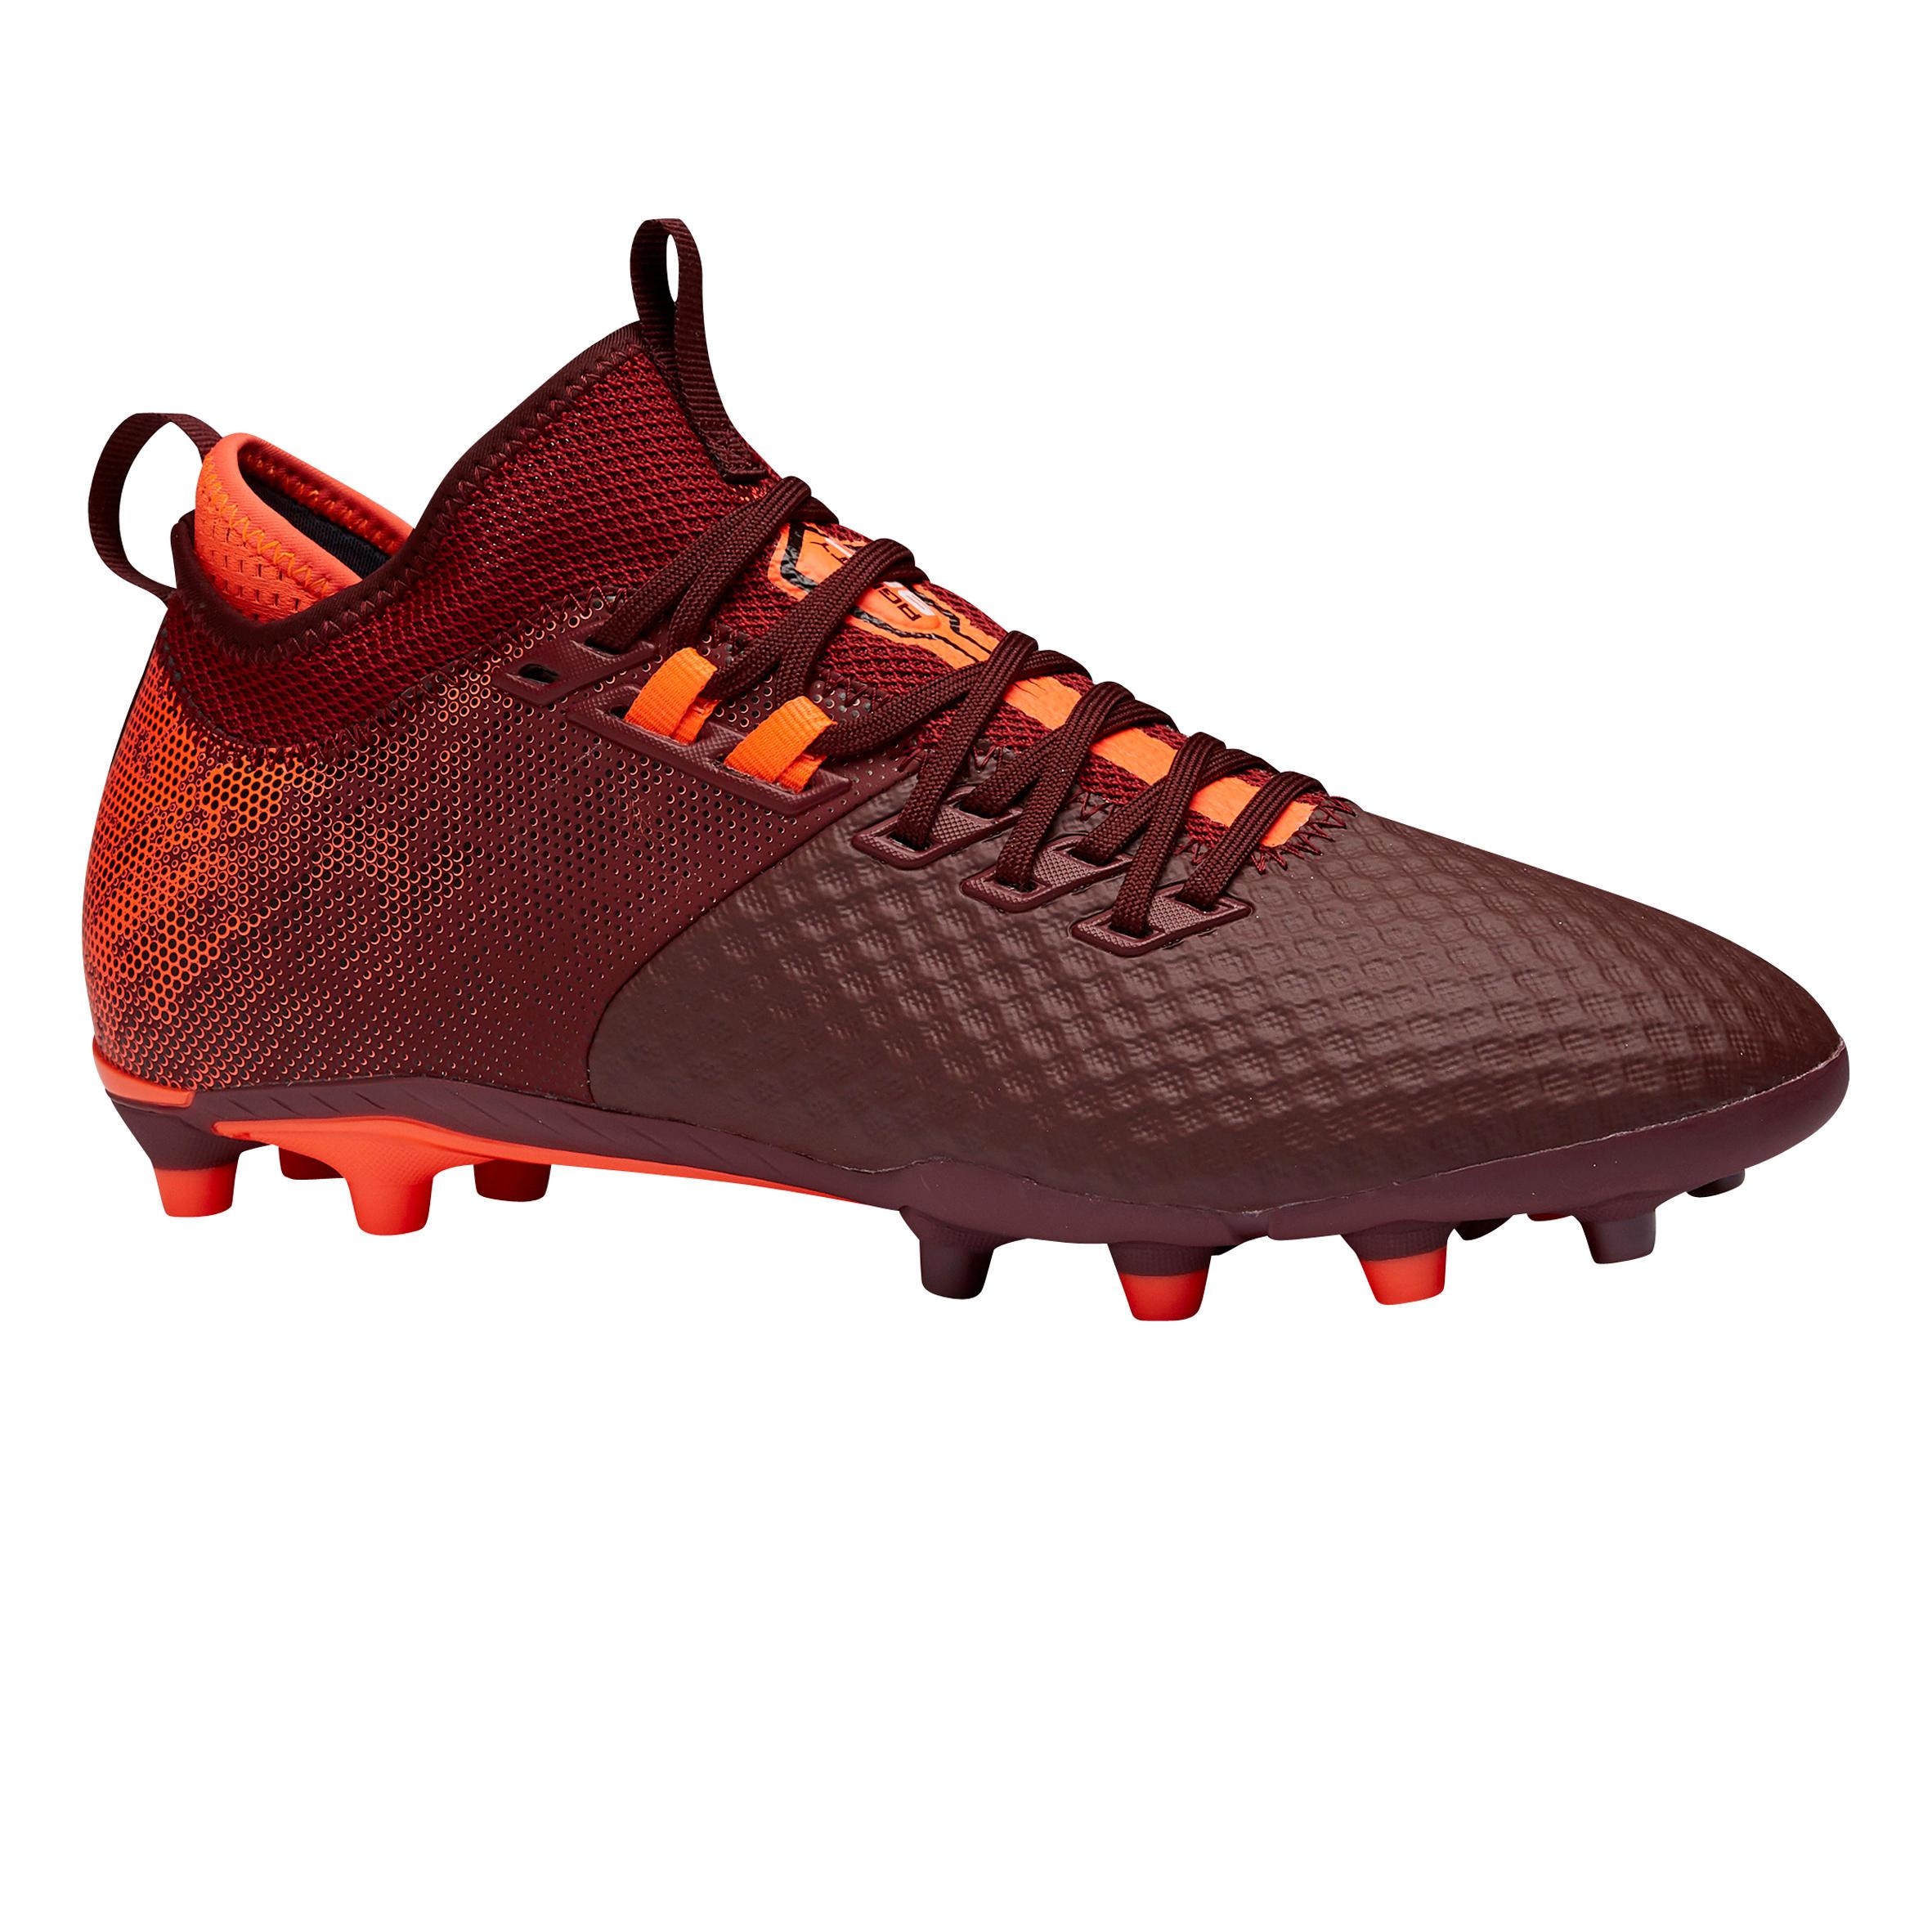 Chaussure de football adulte terrains secs agility 900 mesh mid fg bordeaux kipsta